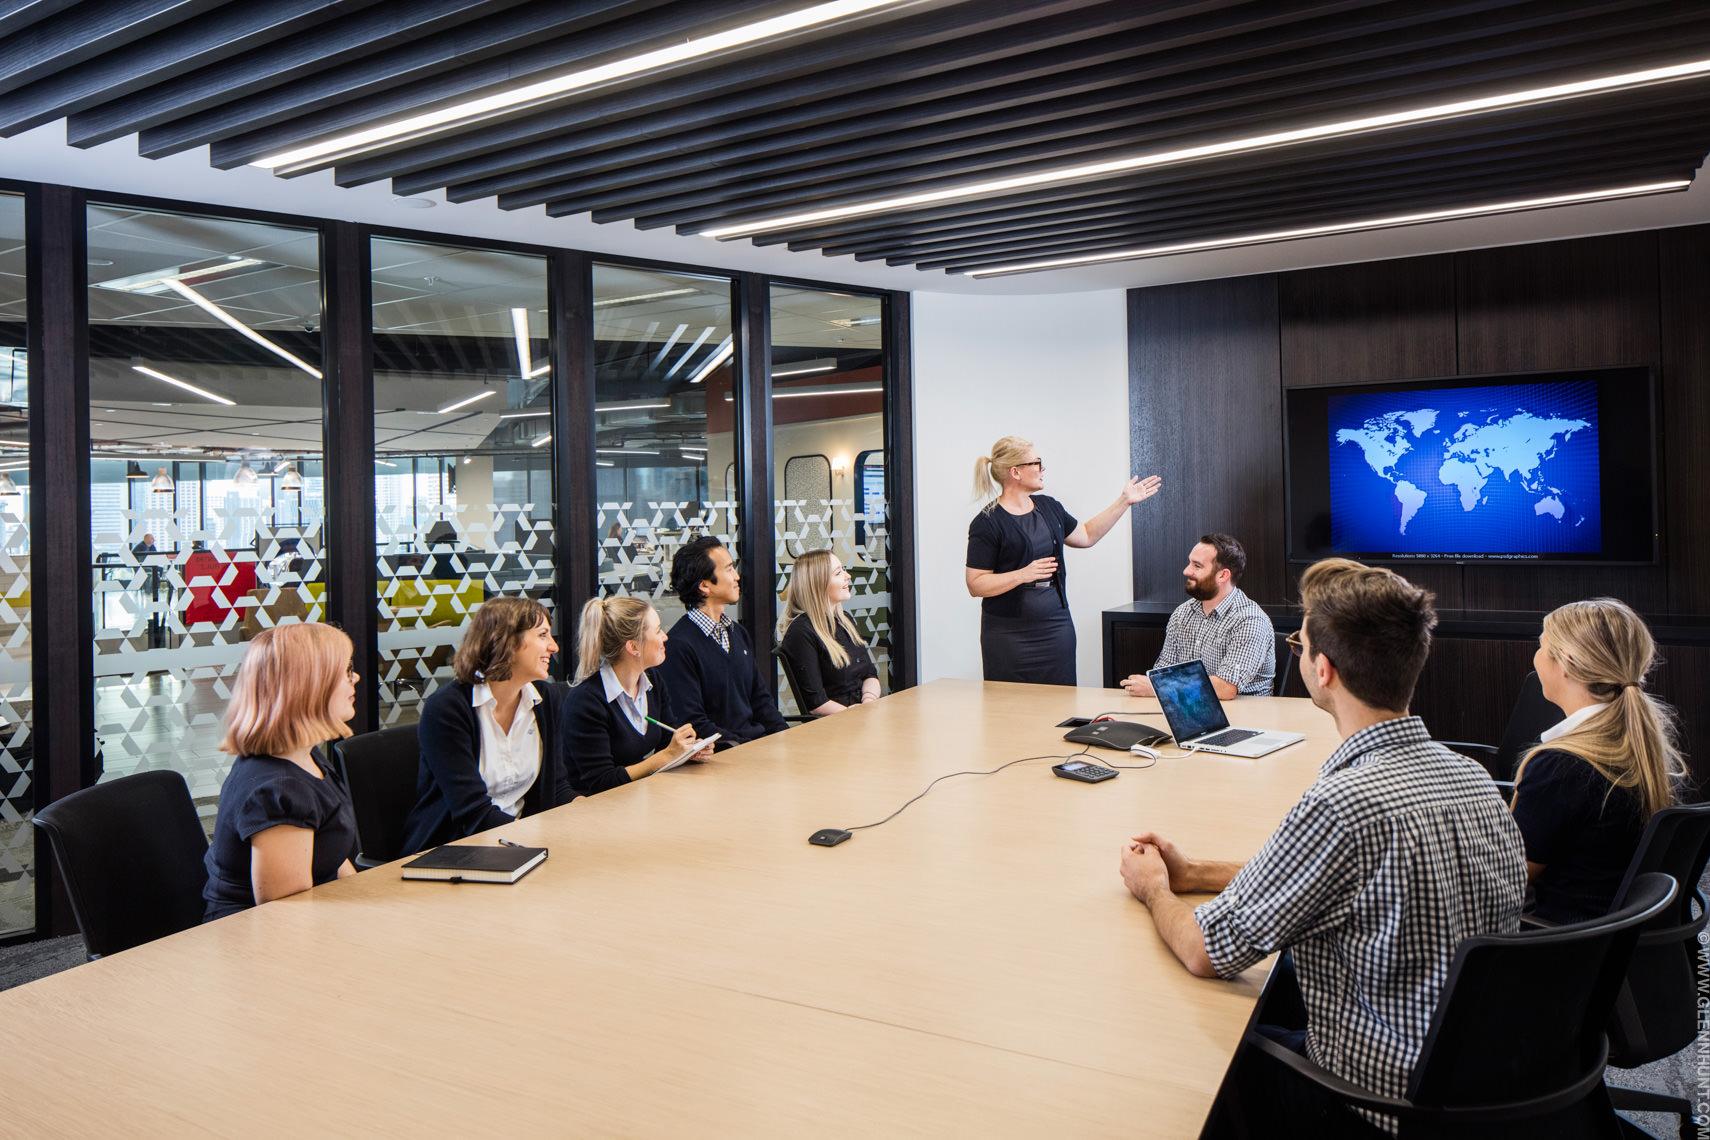 Brisbane Corporate Photography